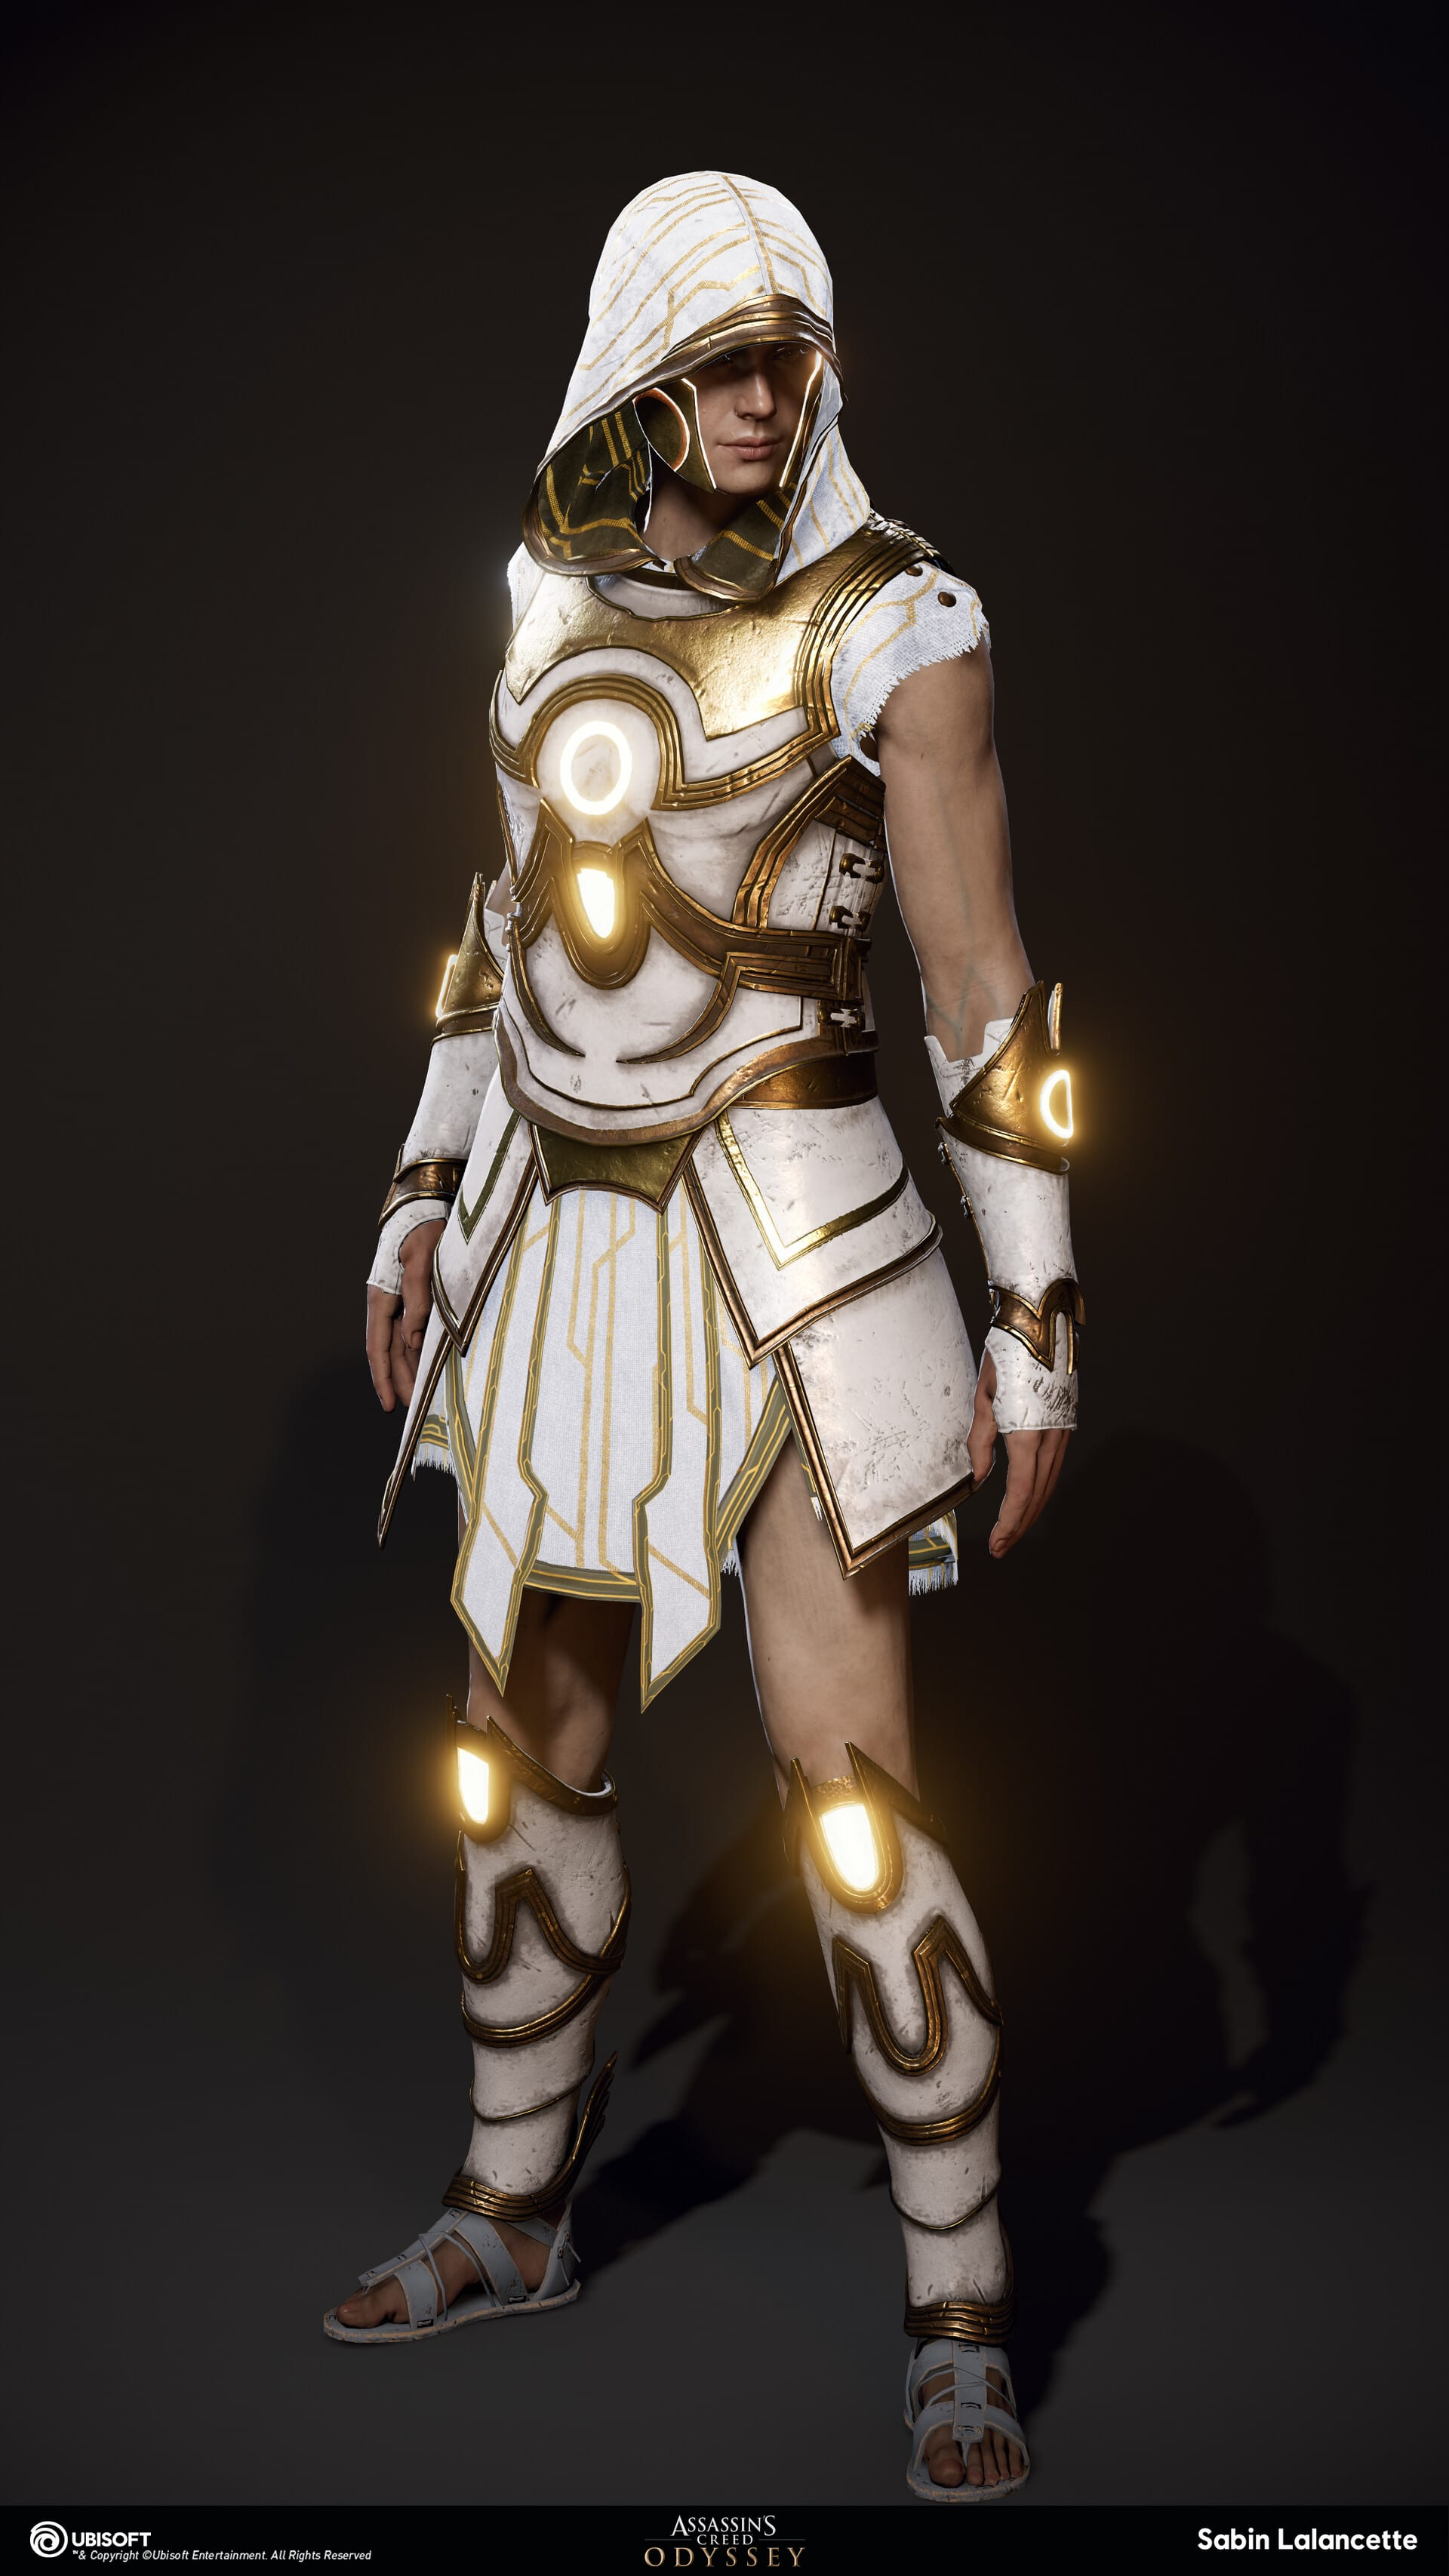 sabin-lalancette-artblast-fullsize-outfit-elysium-front-kassandra-slalancette